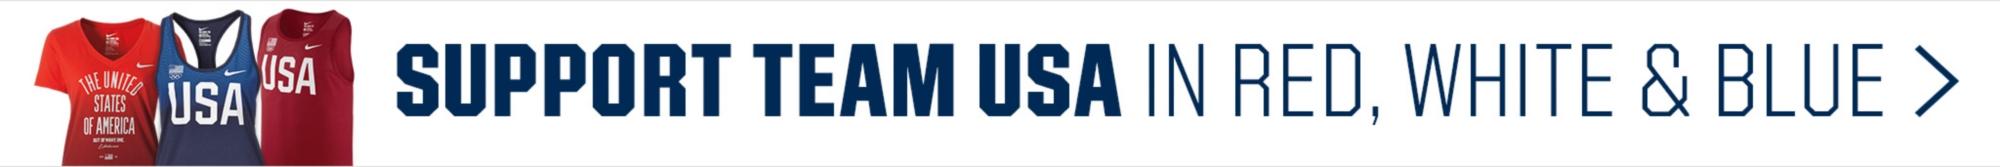 Support Team USA